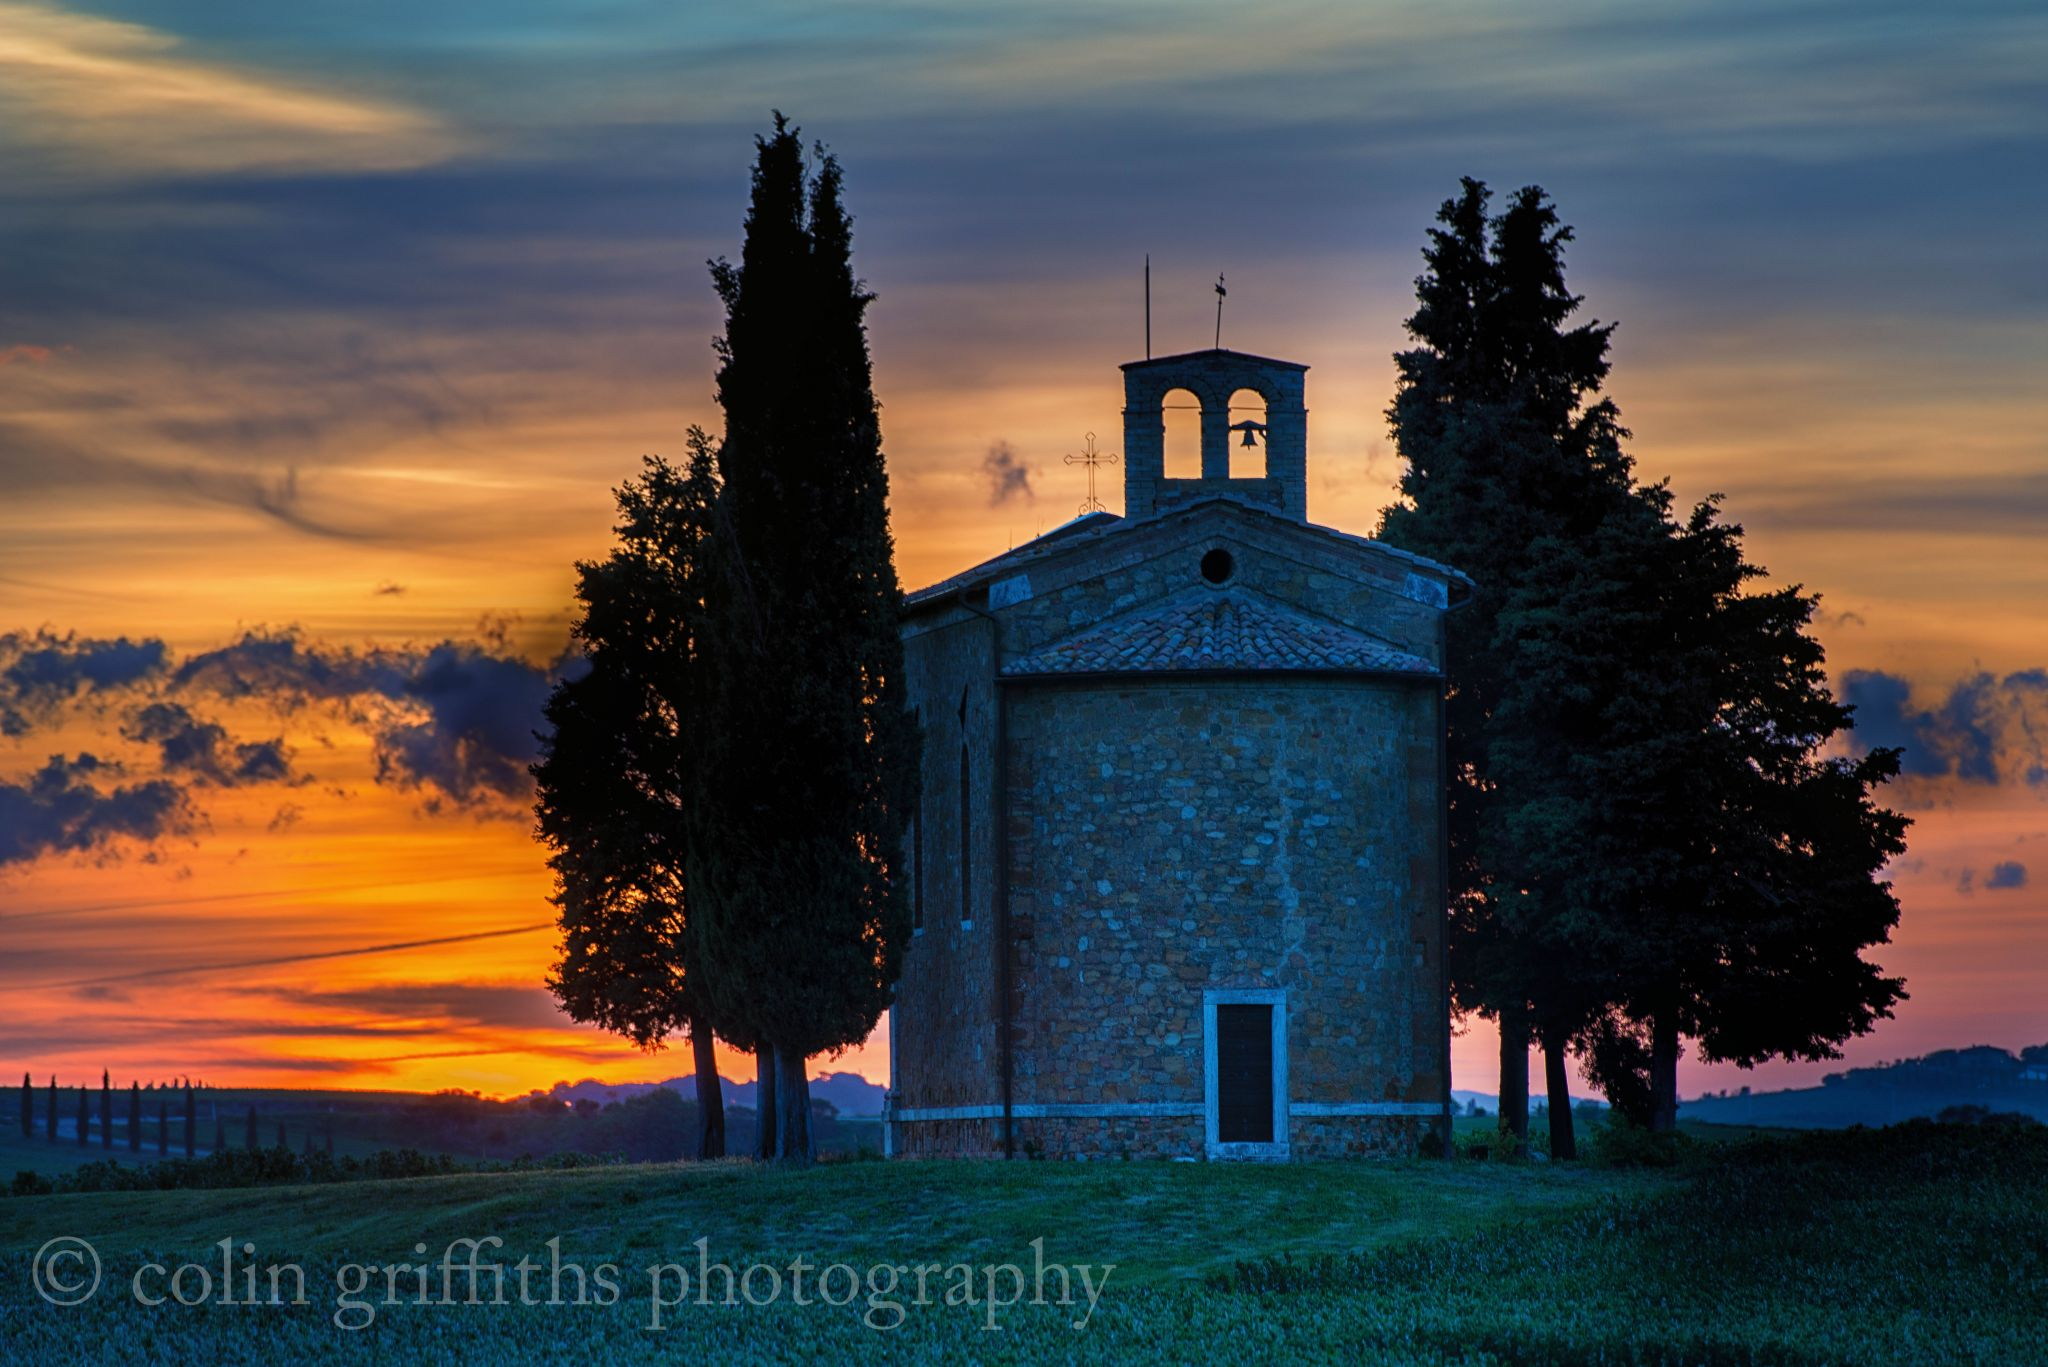 Chapel of the Madonna di Vitaleta, Italy